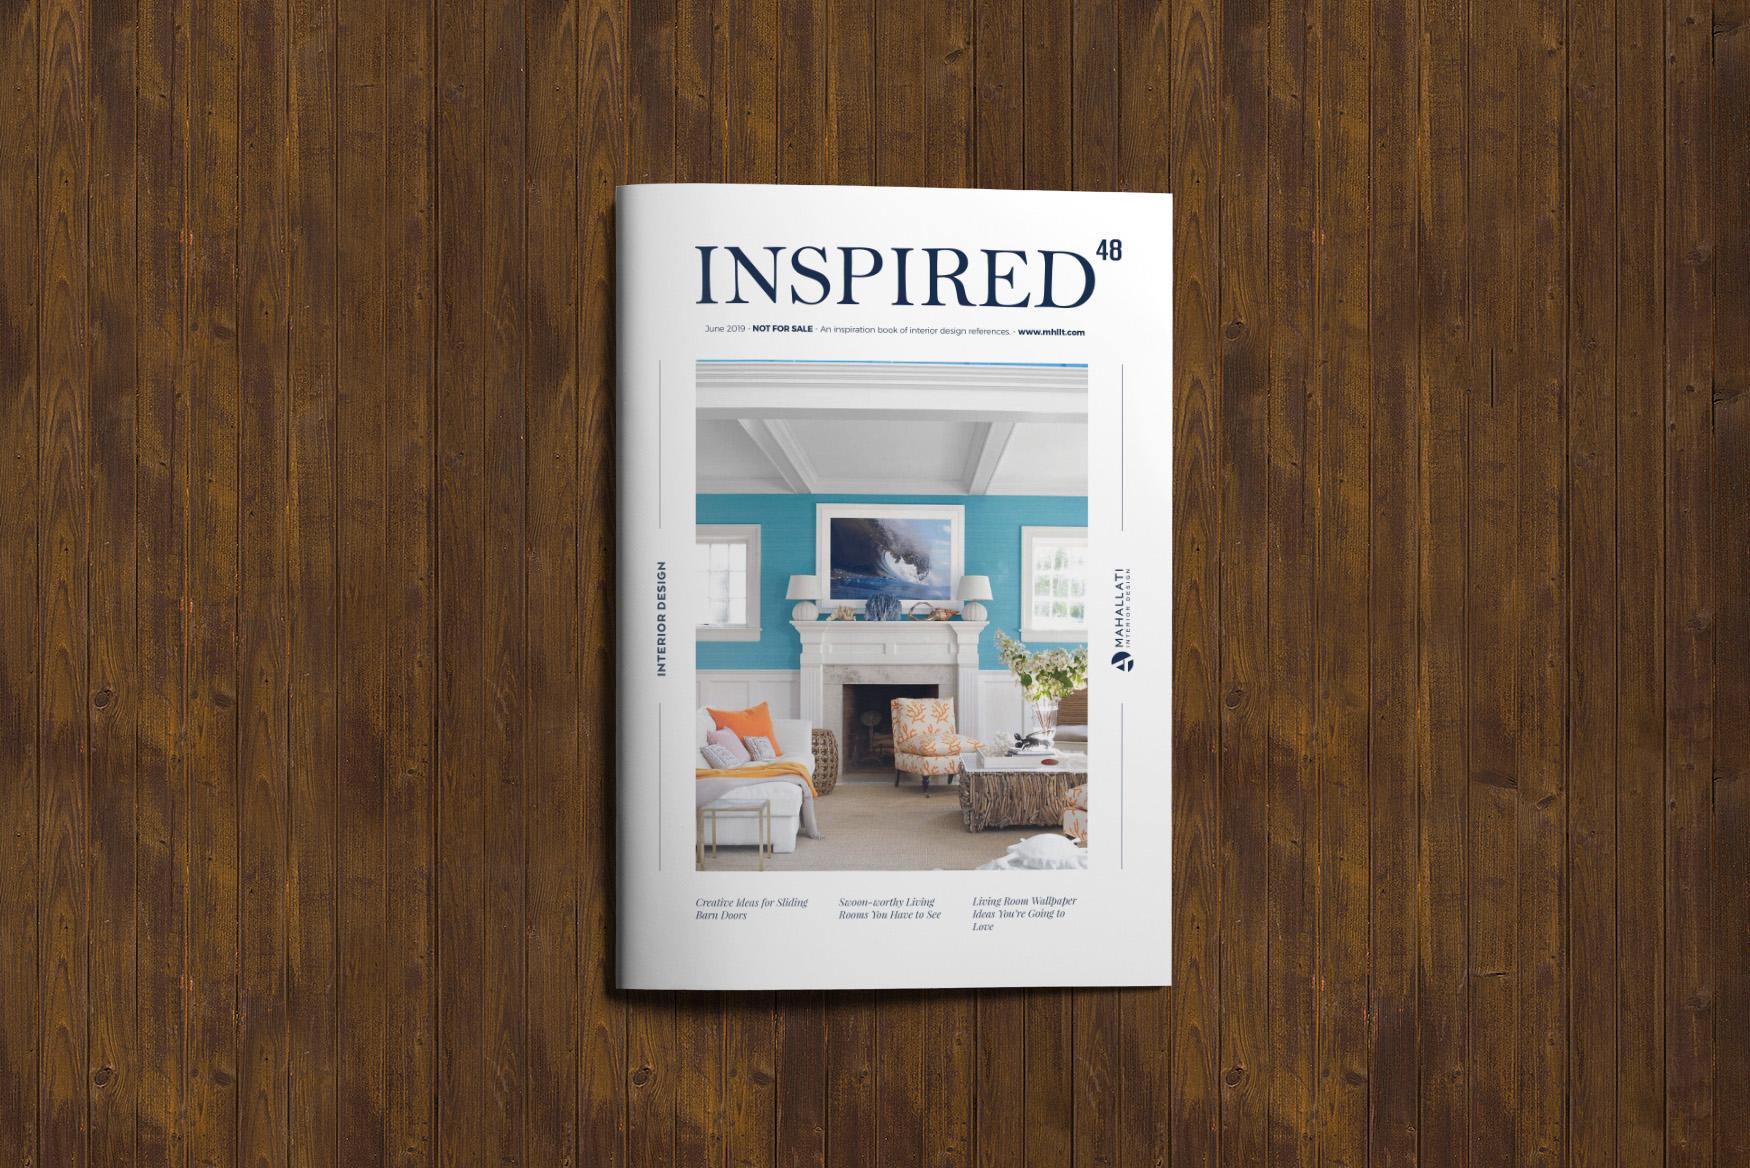 Inspired Vol 48 - June 2019